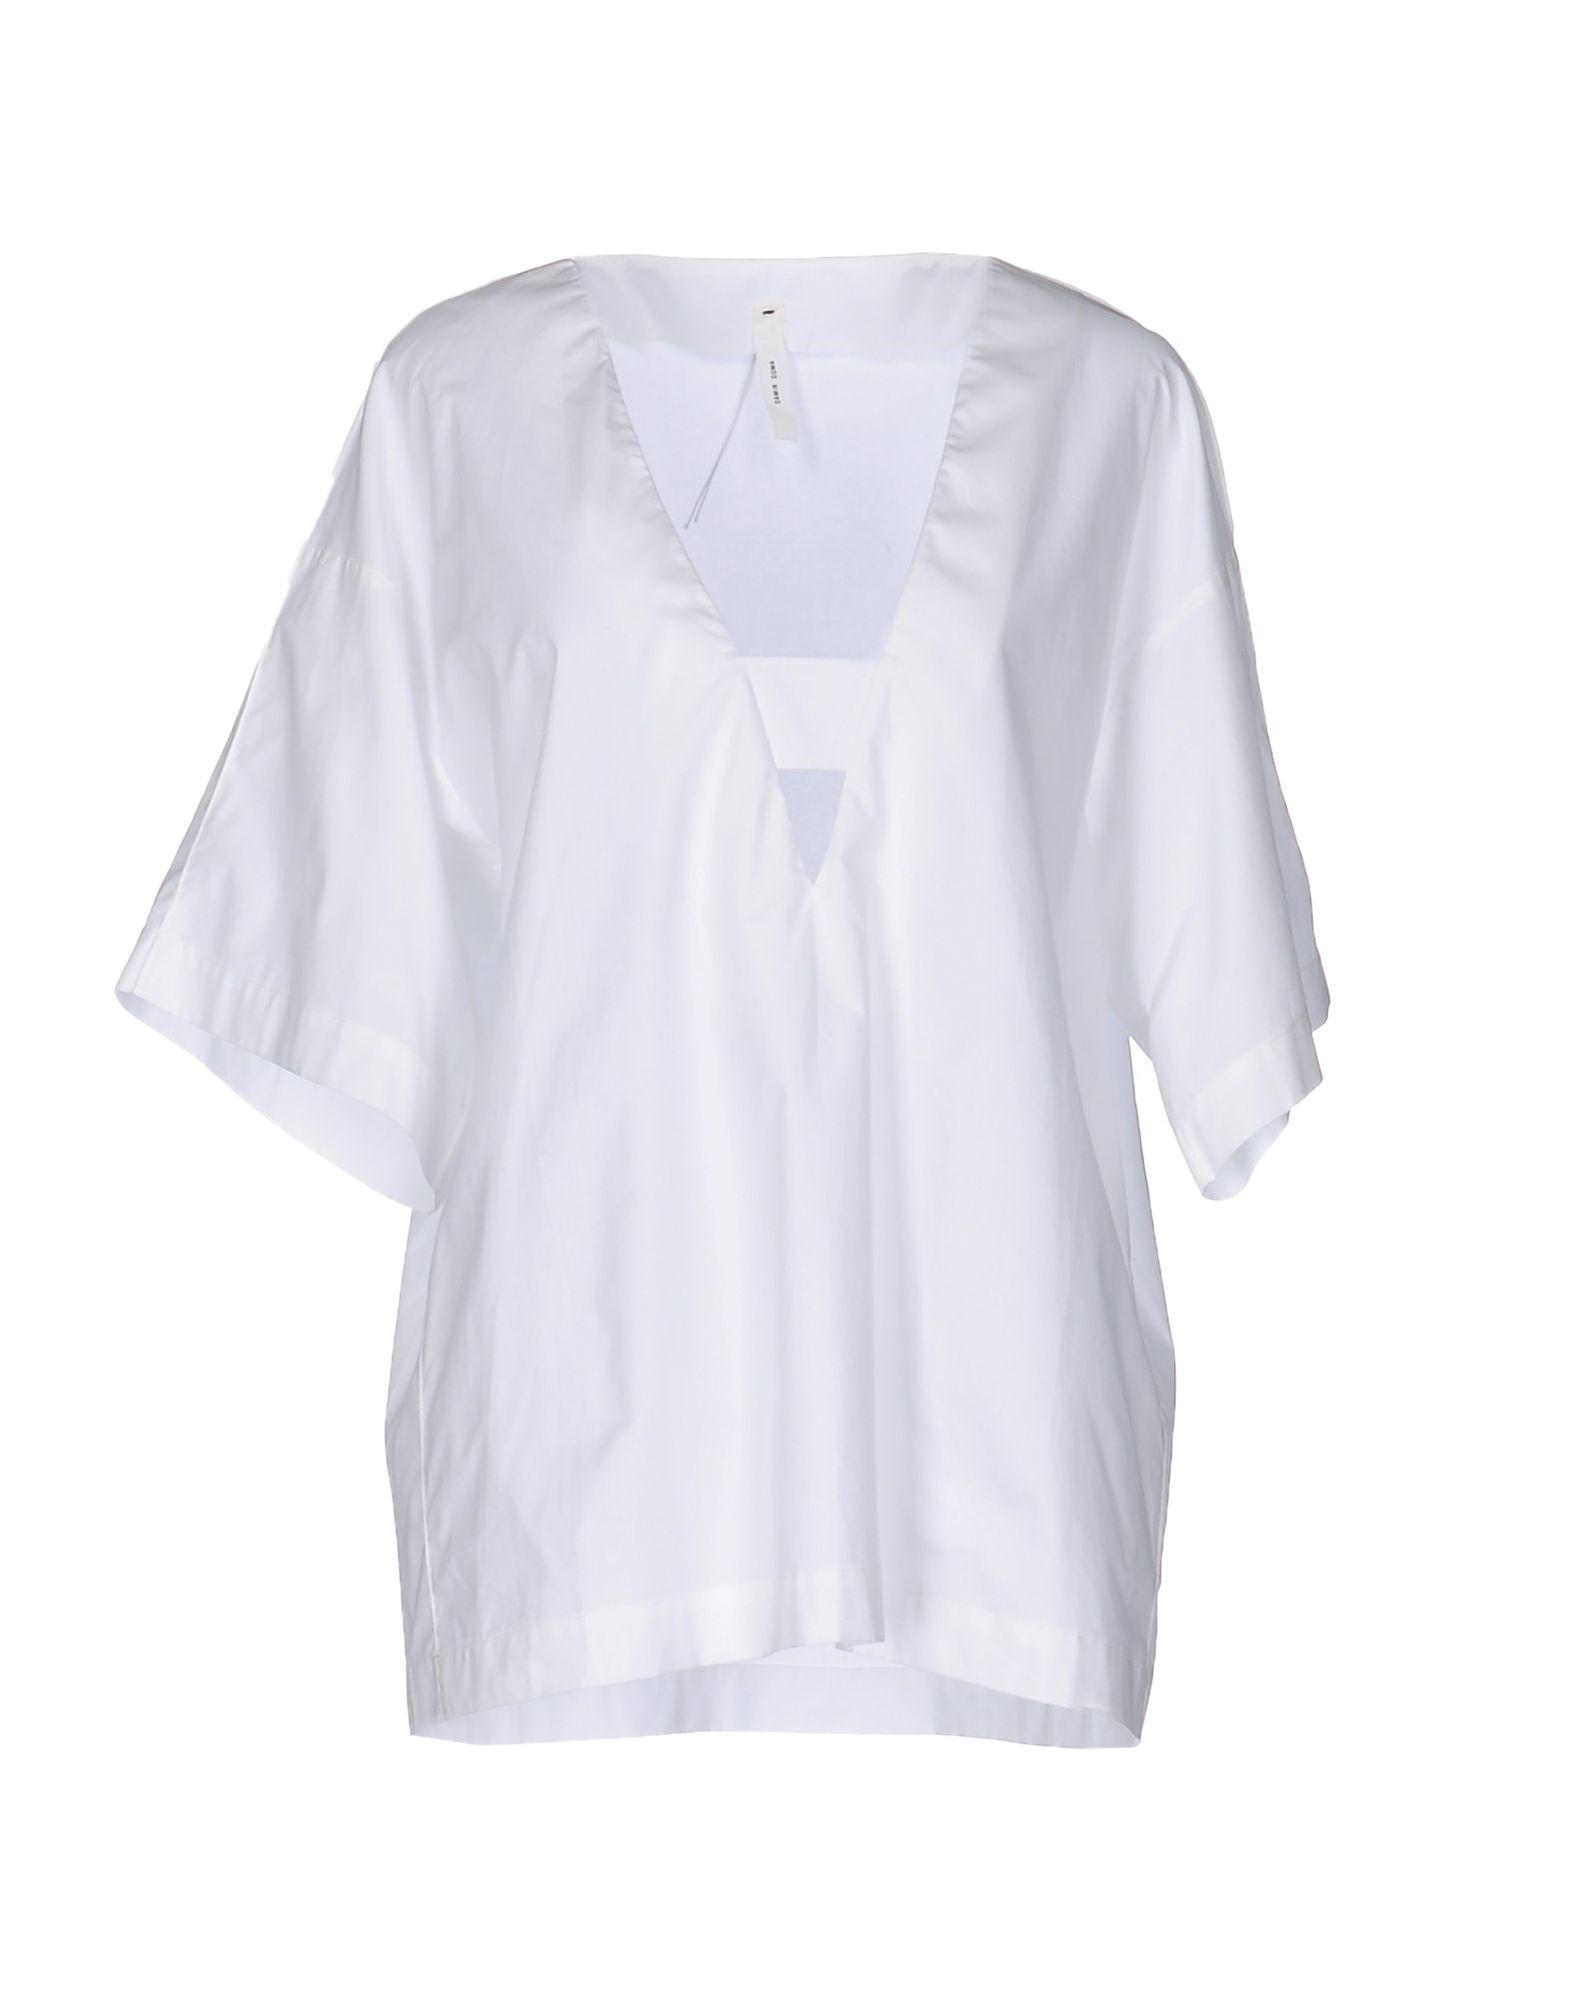 5fa3f79c8cb200 Damir Doma Blouse in White - Lyst